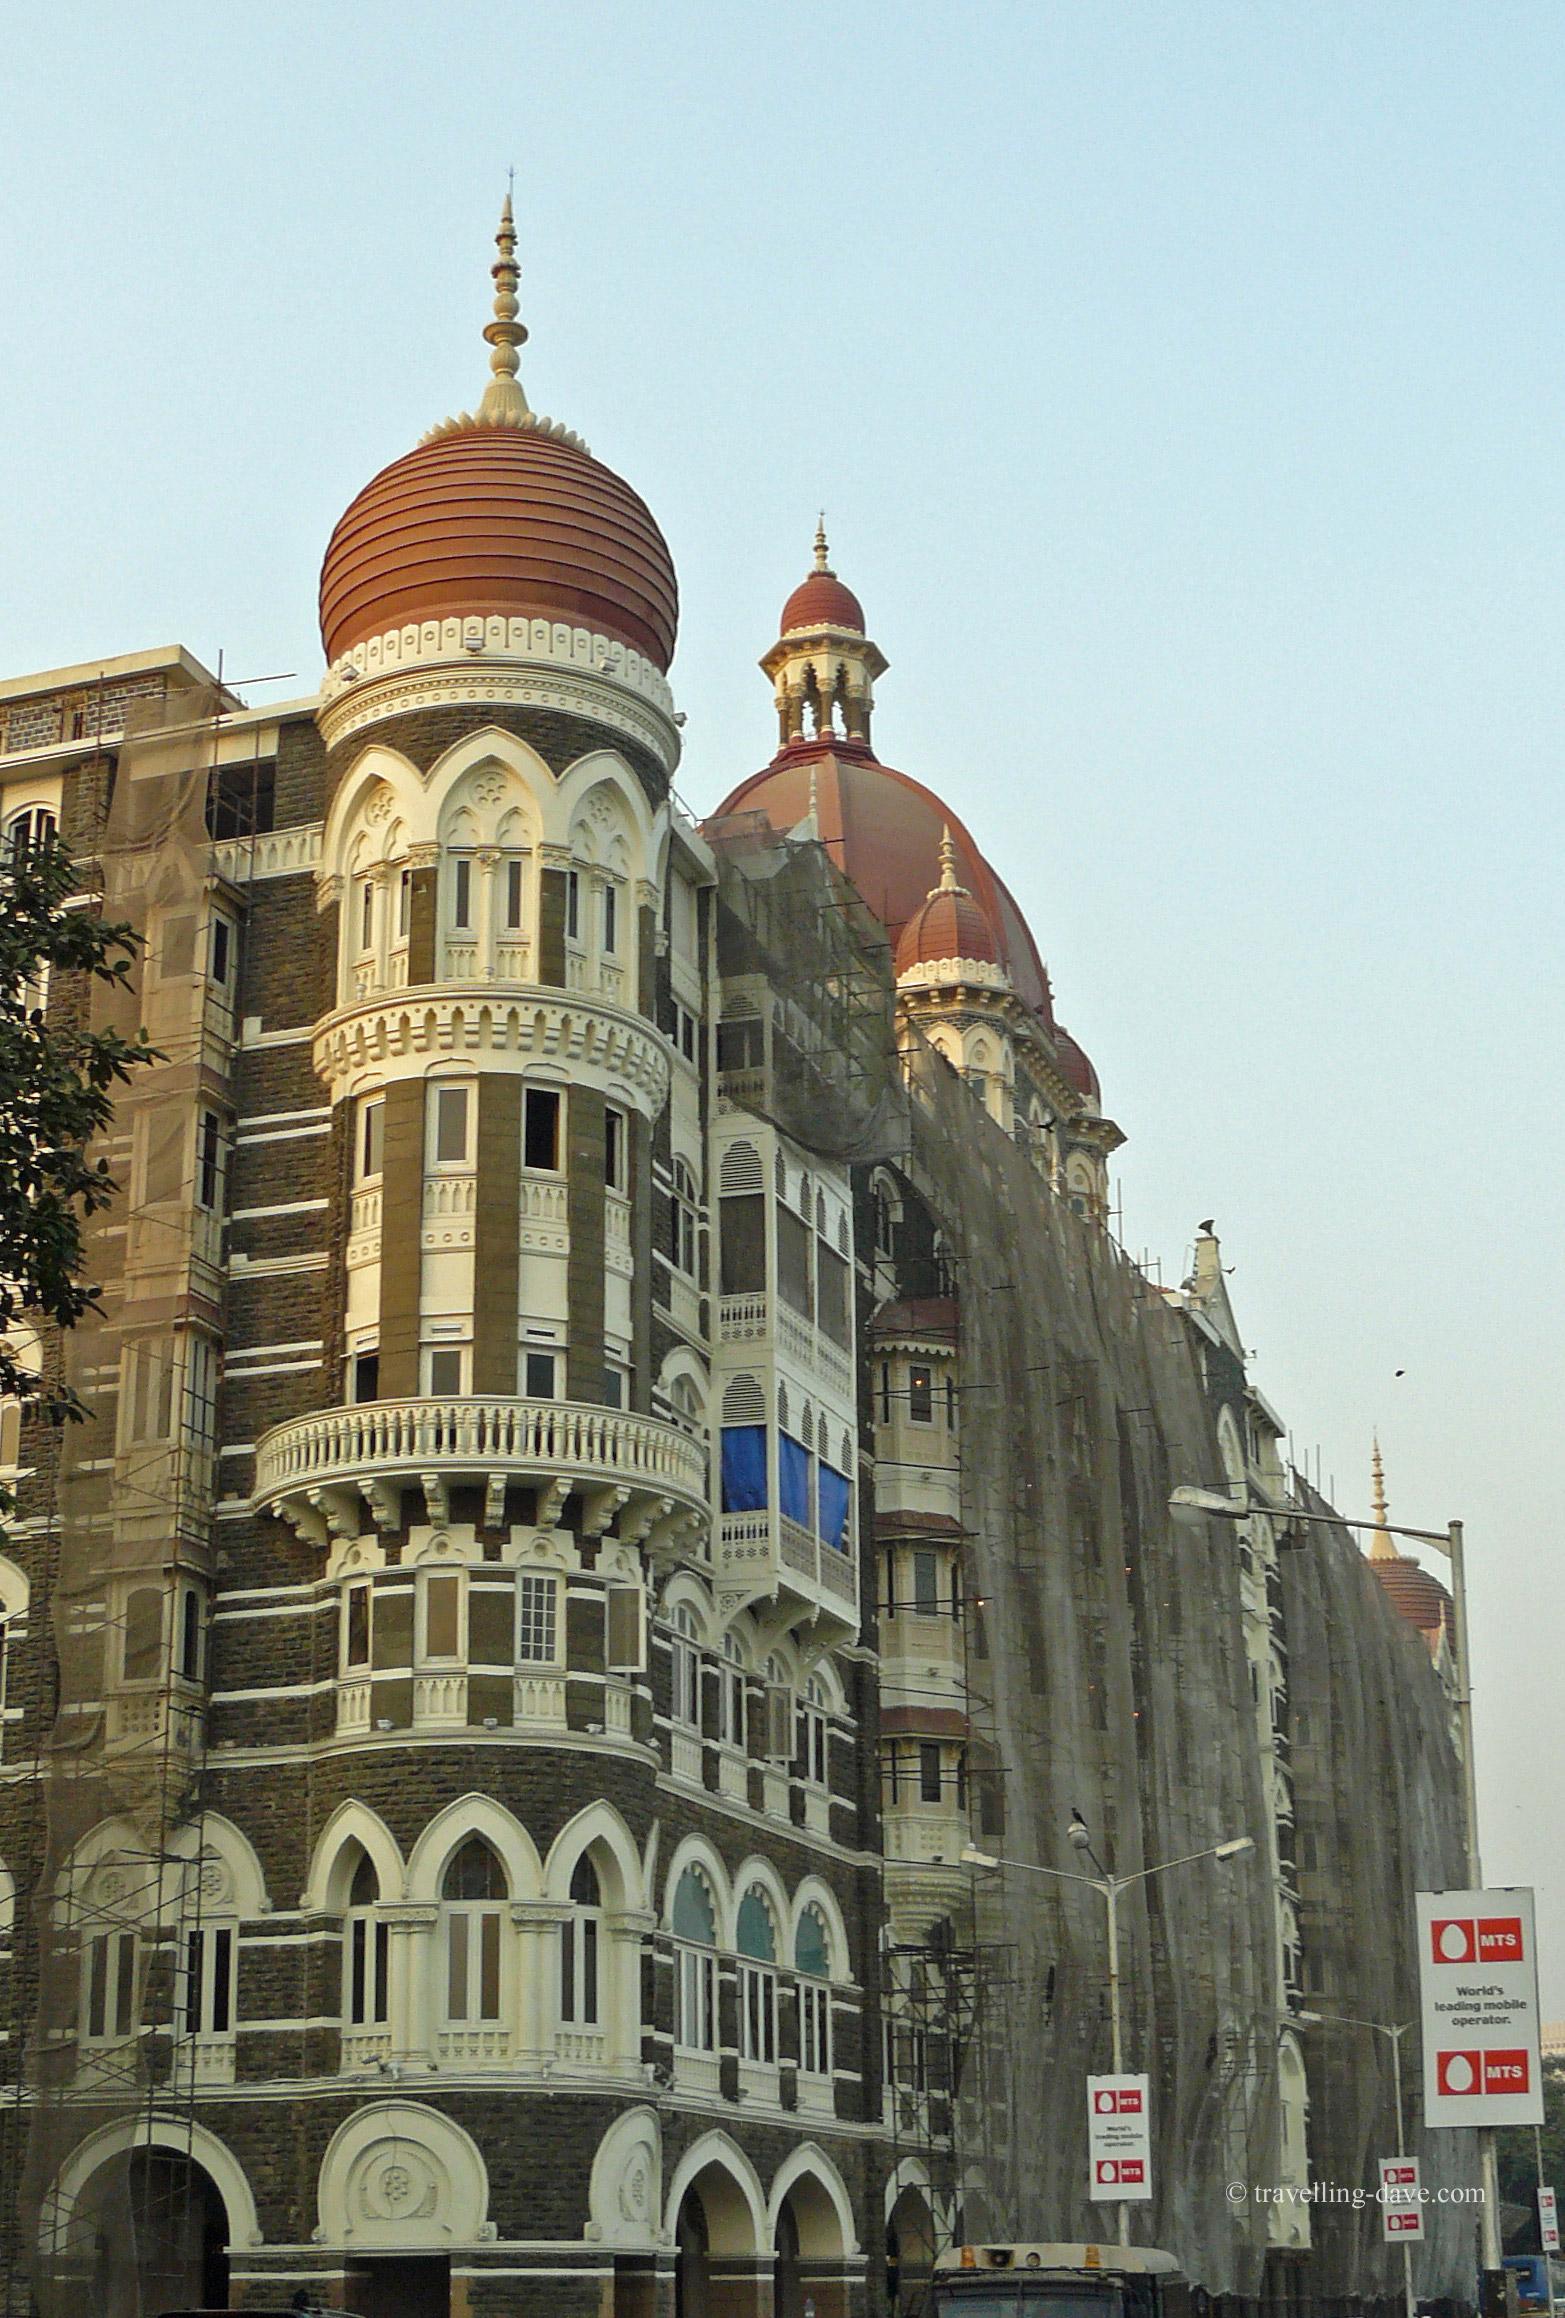 Side view of the Taj Mahal Palace Hotel in Mumbai